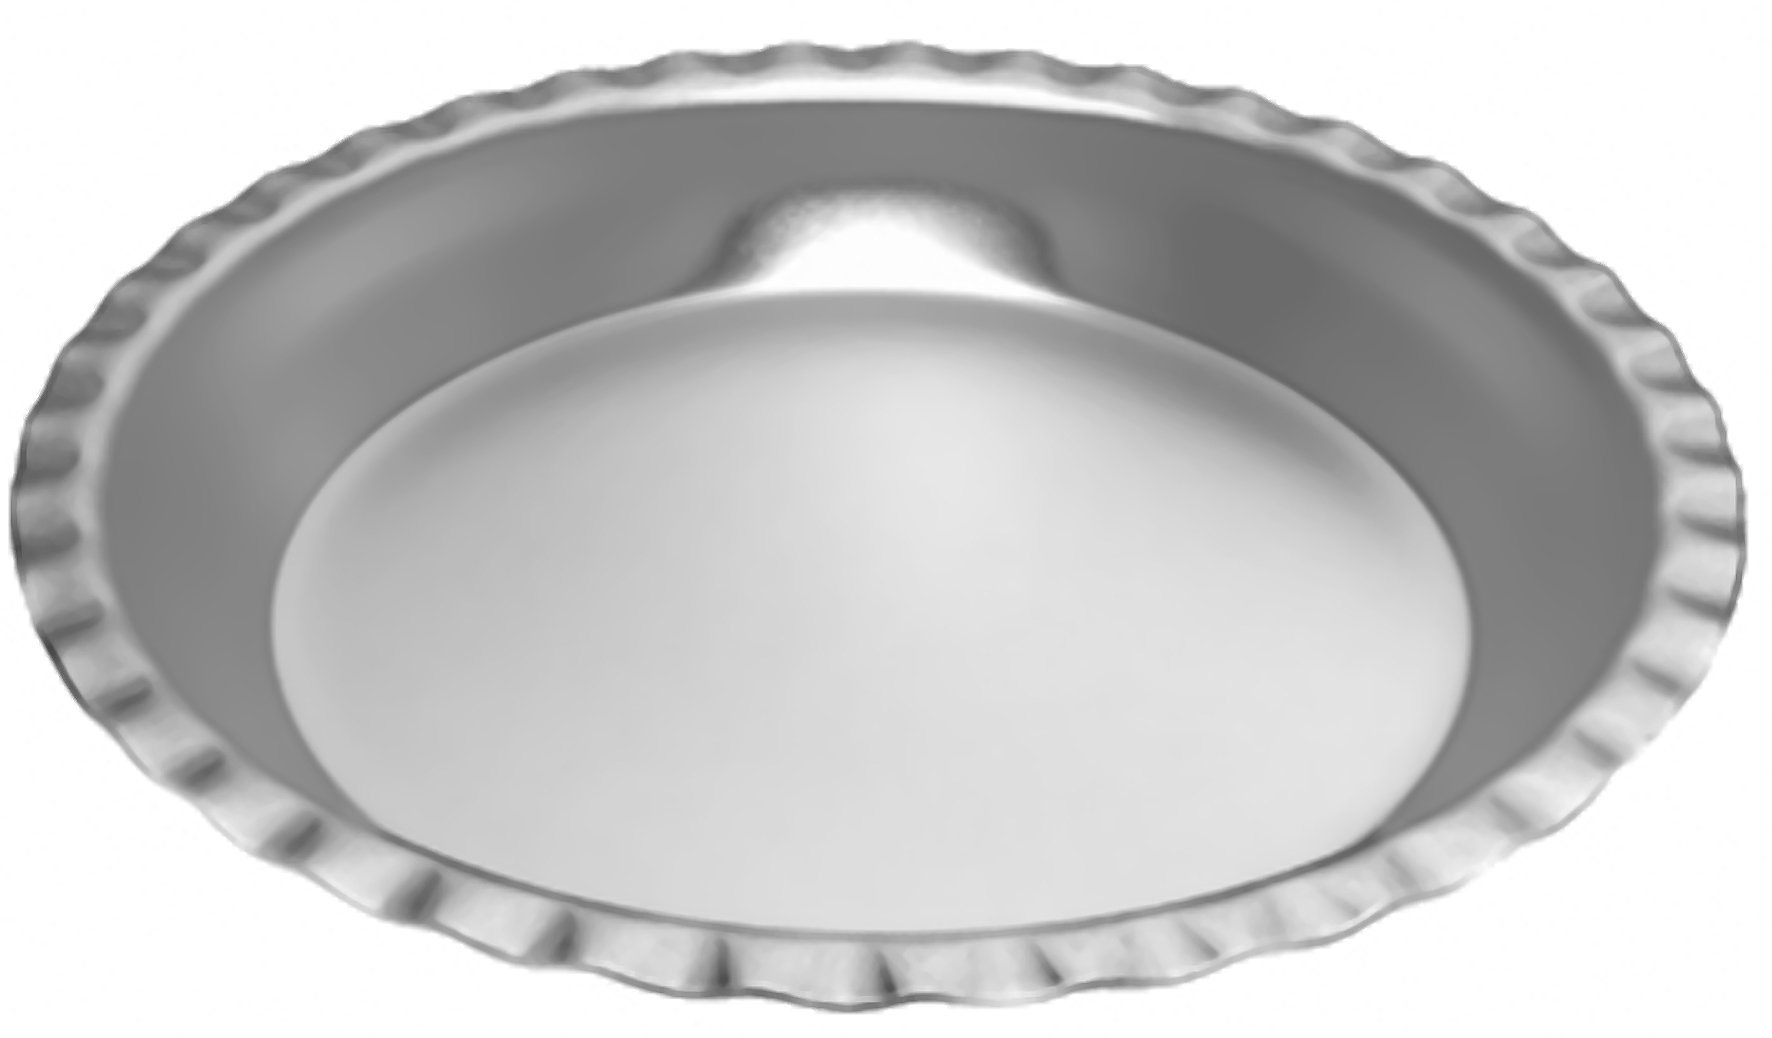 Alan Silverwood 9'' Fluted Pie Pan Dish 22393